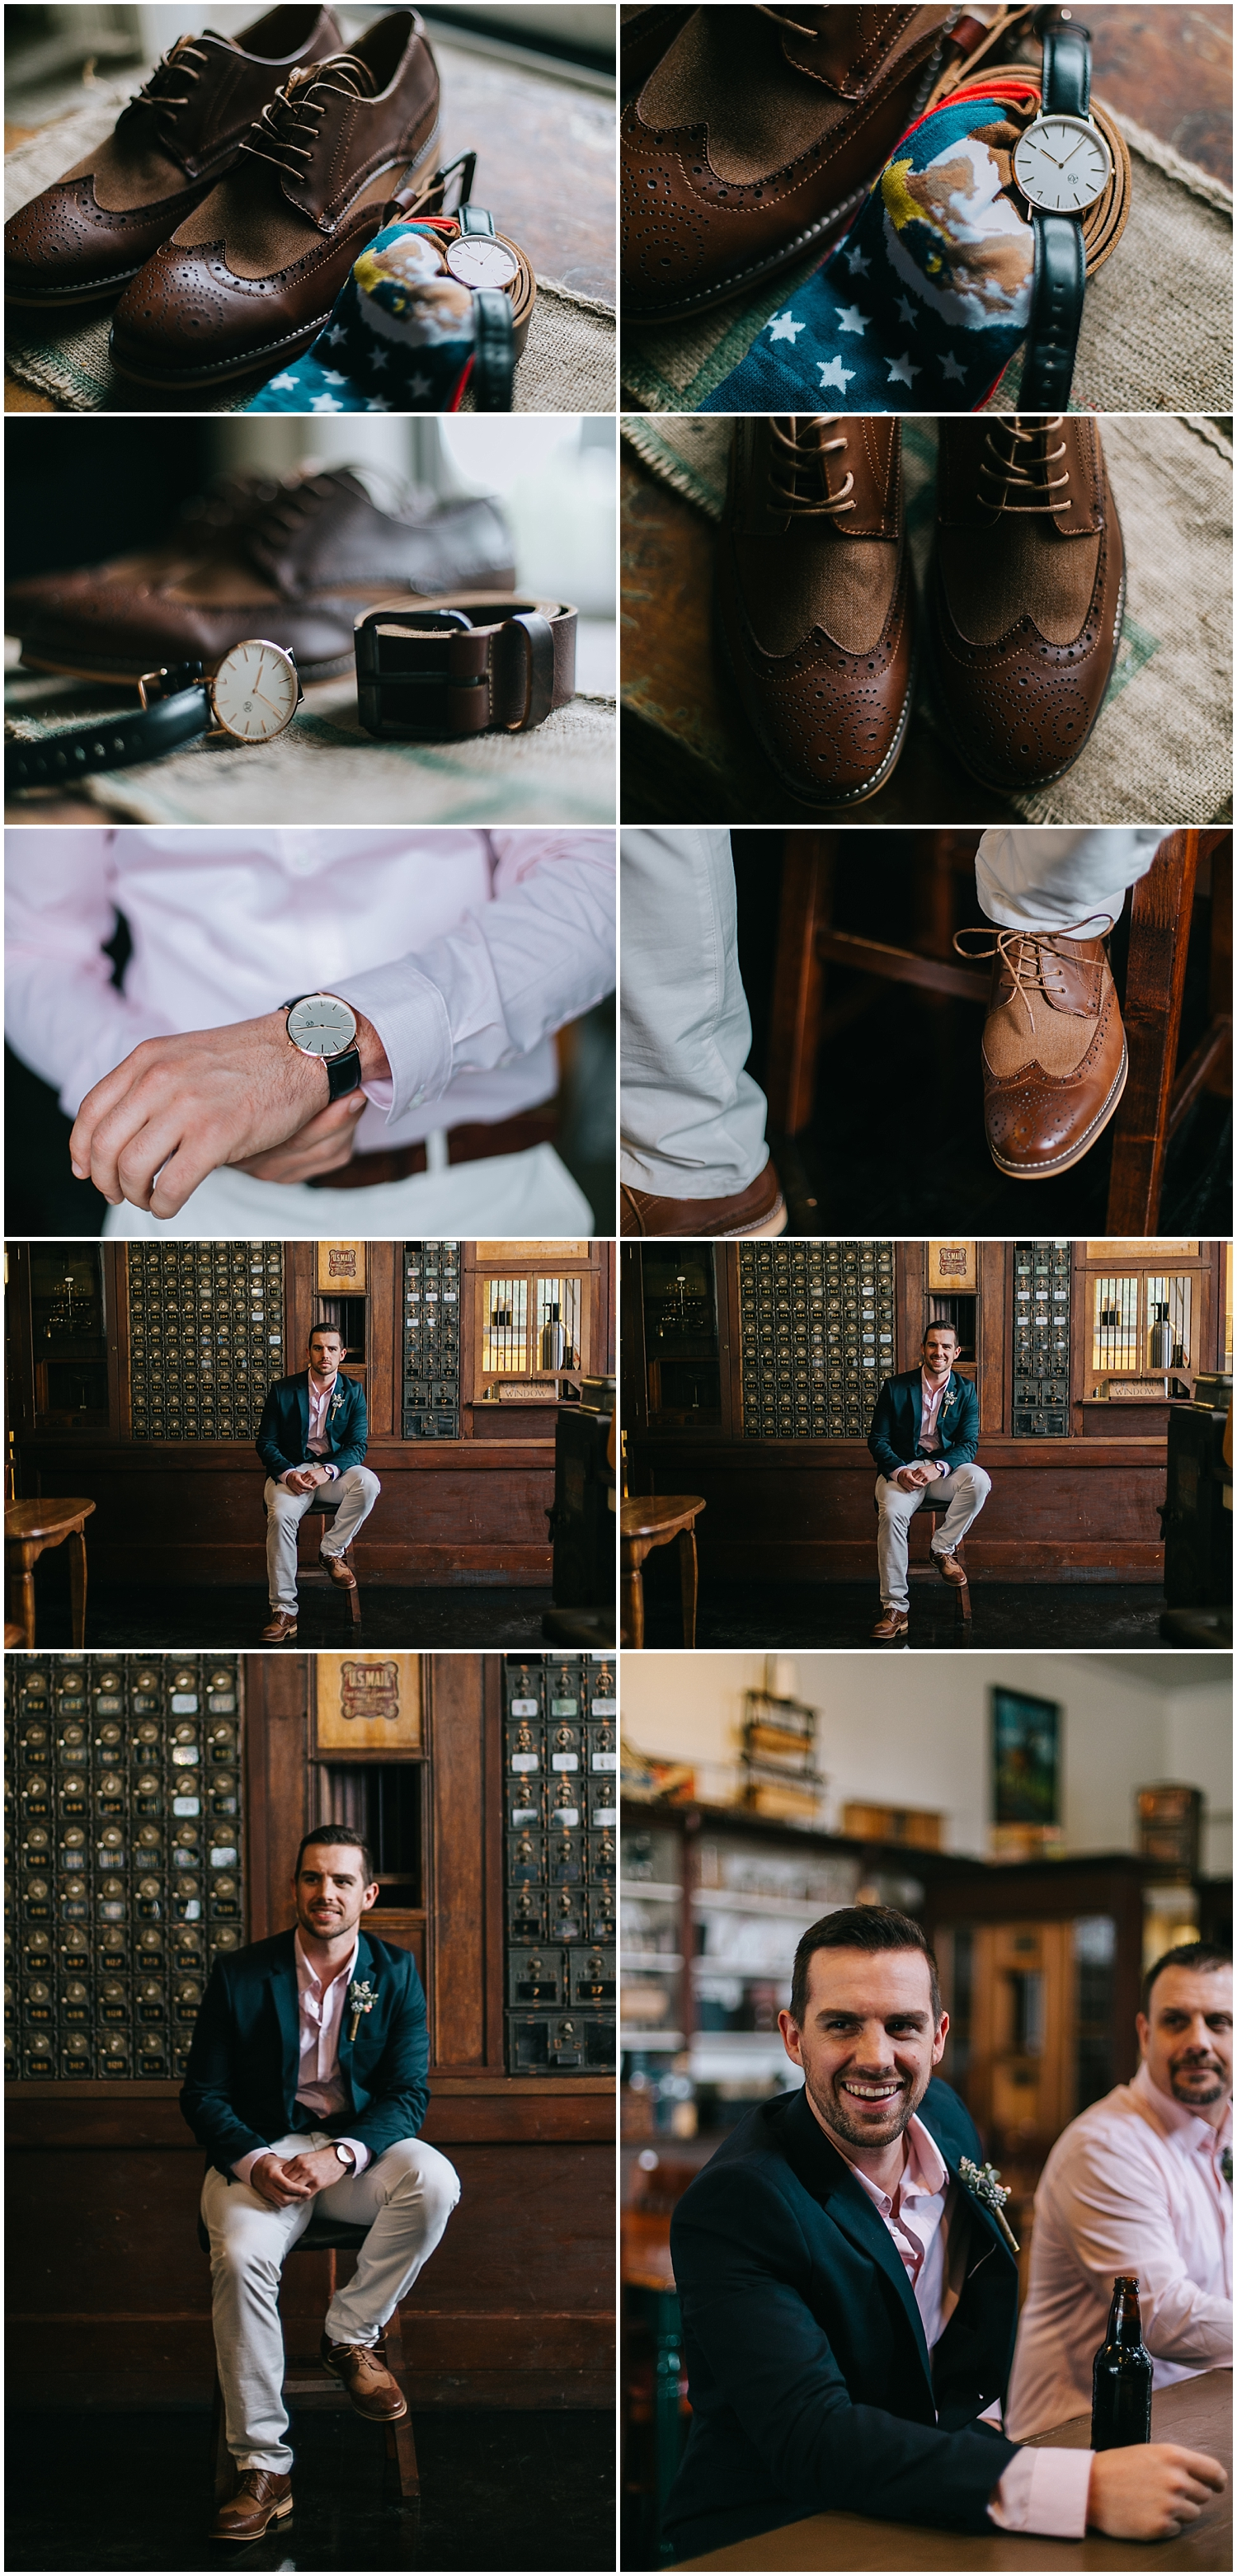 Stocking-Wedding-00001.jpg